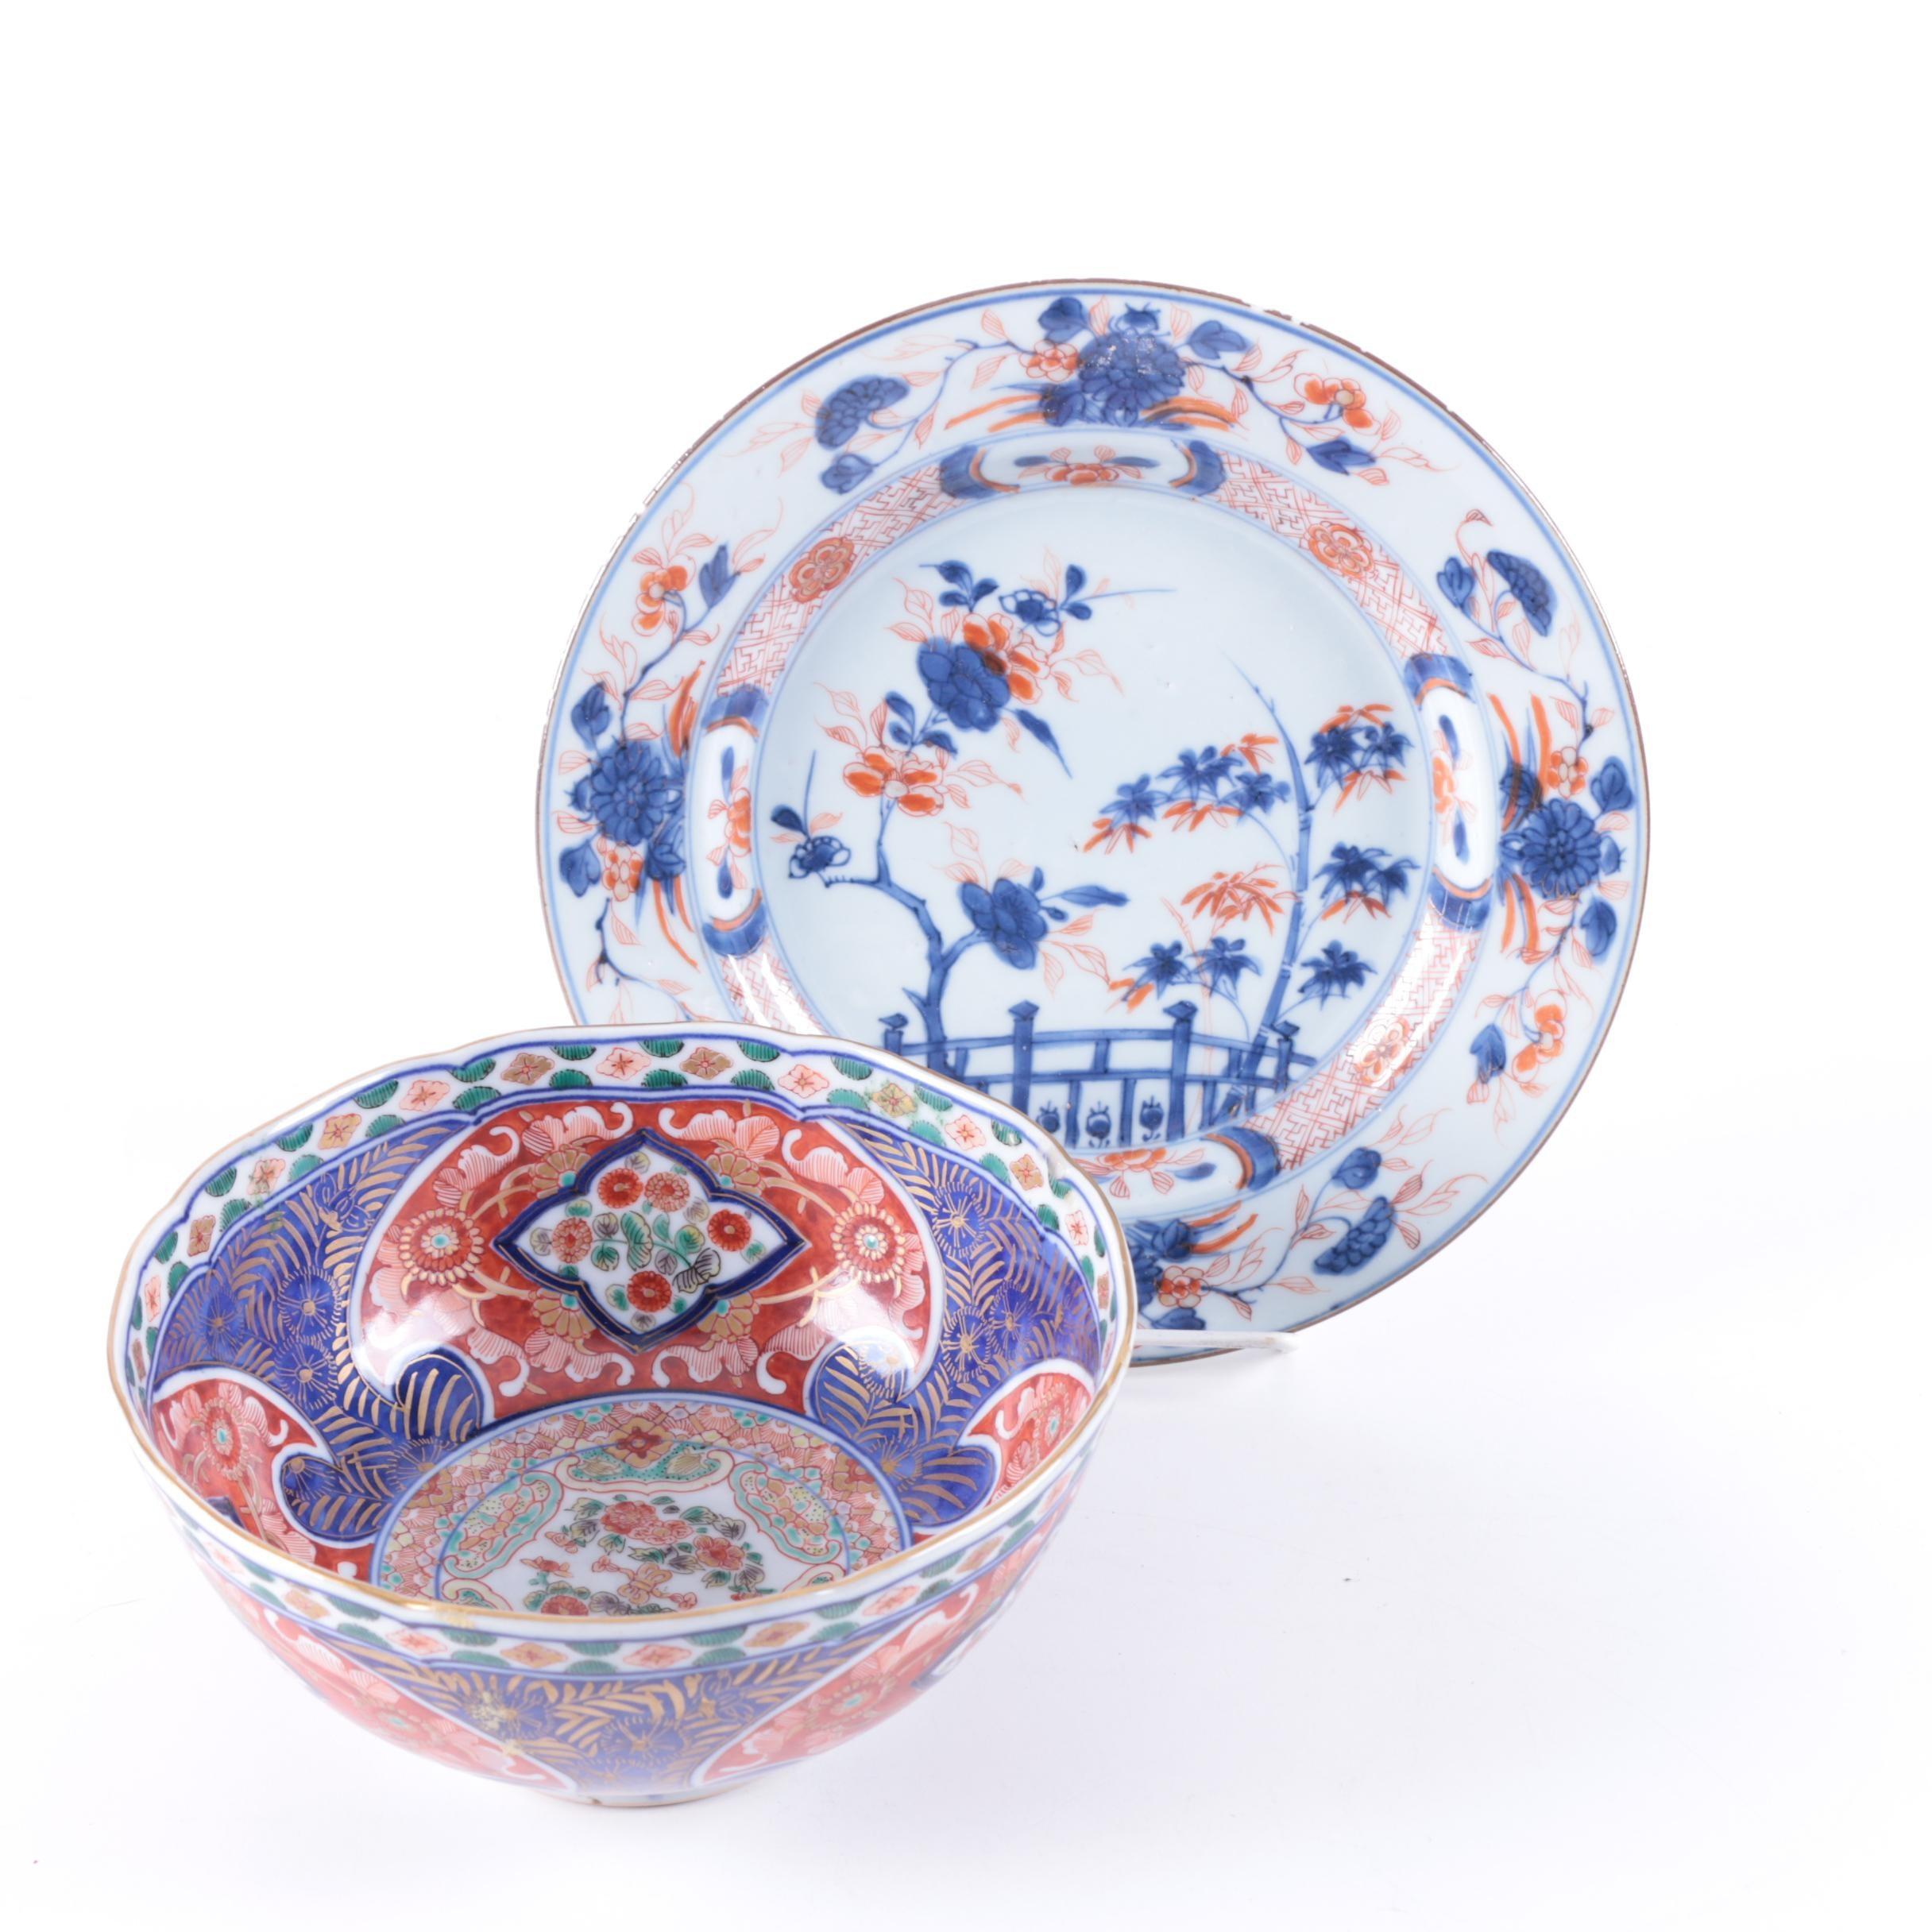 Japanese Imari Porcelain Bowl and Plate